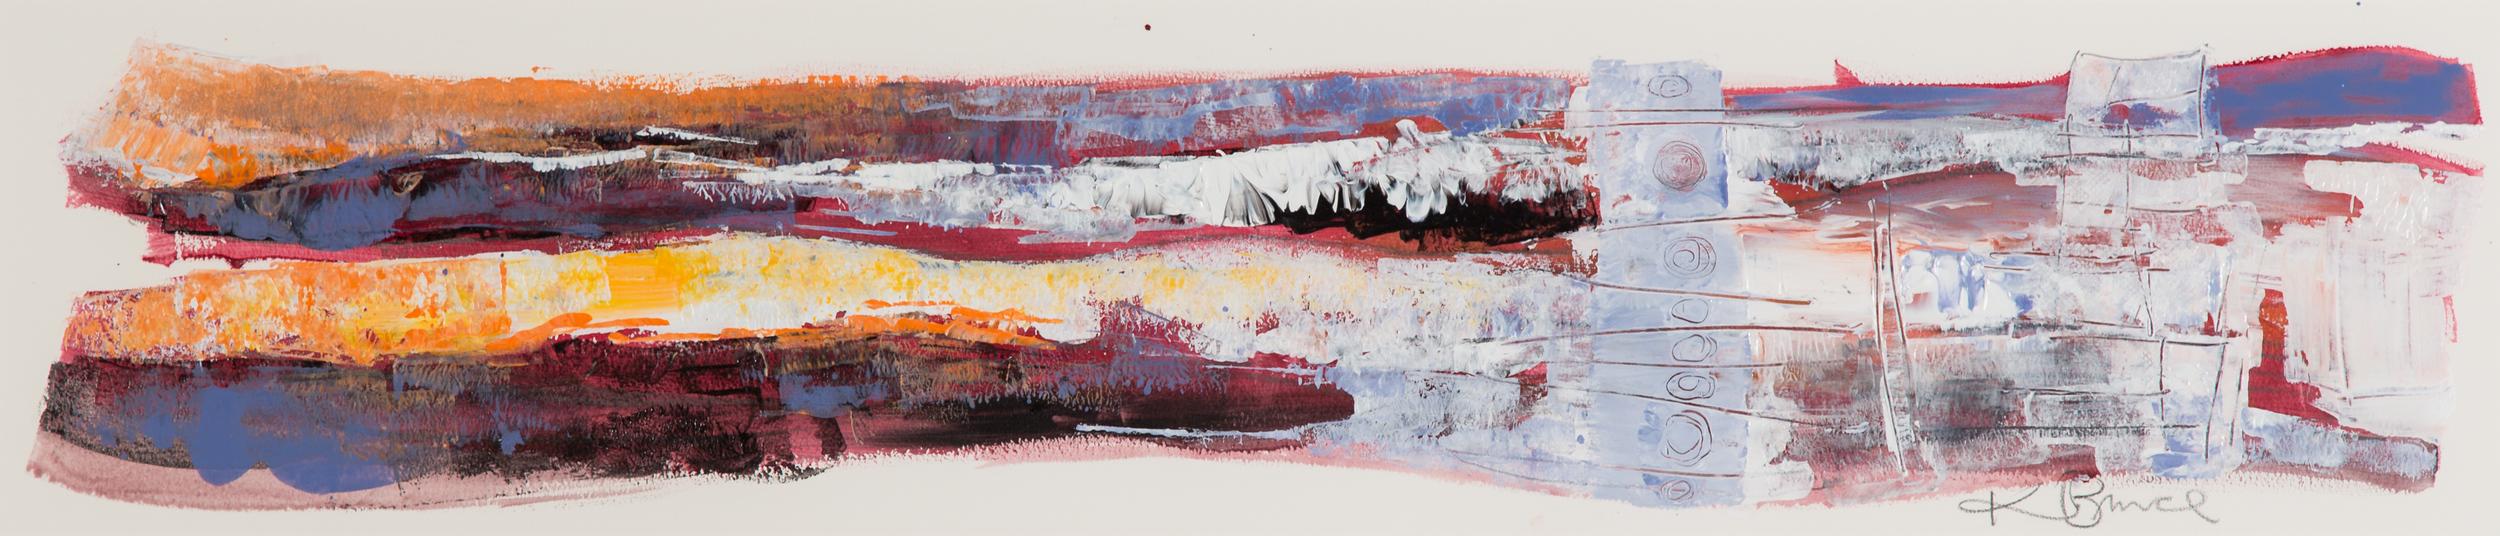 KB-061, Katharine Bruce, September Sunset, Acrylic on Paper, 2015, 45 x 9, $2,350